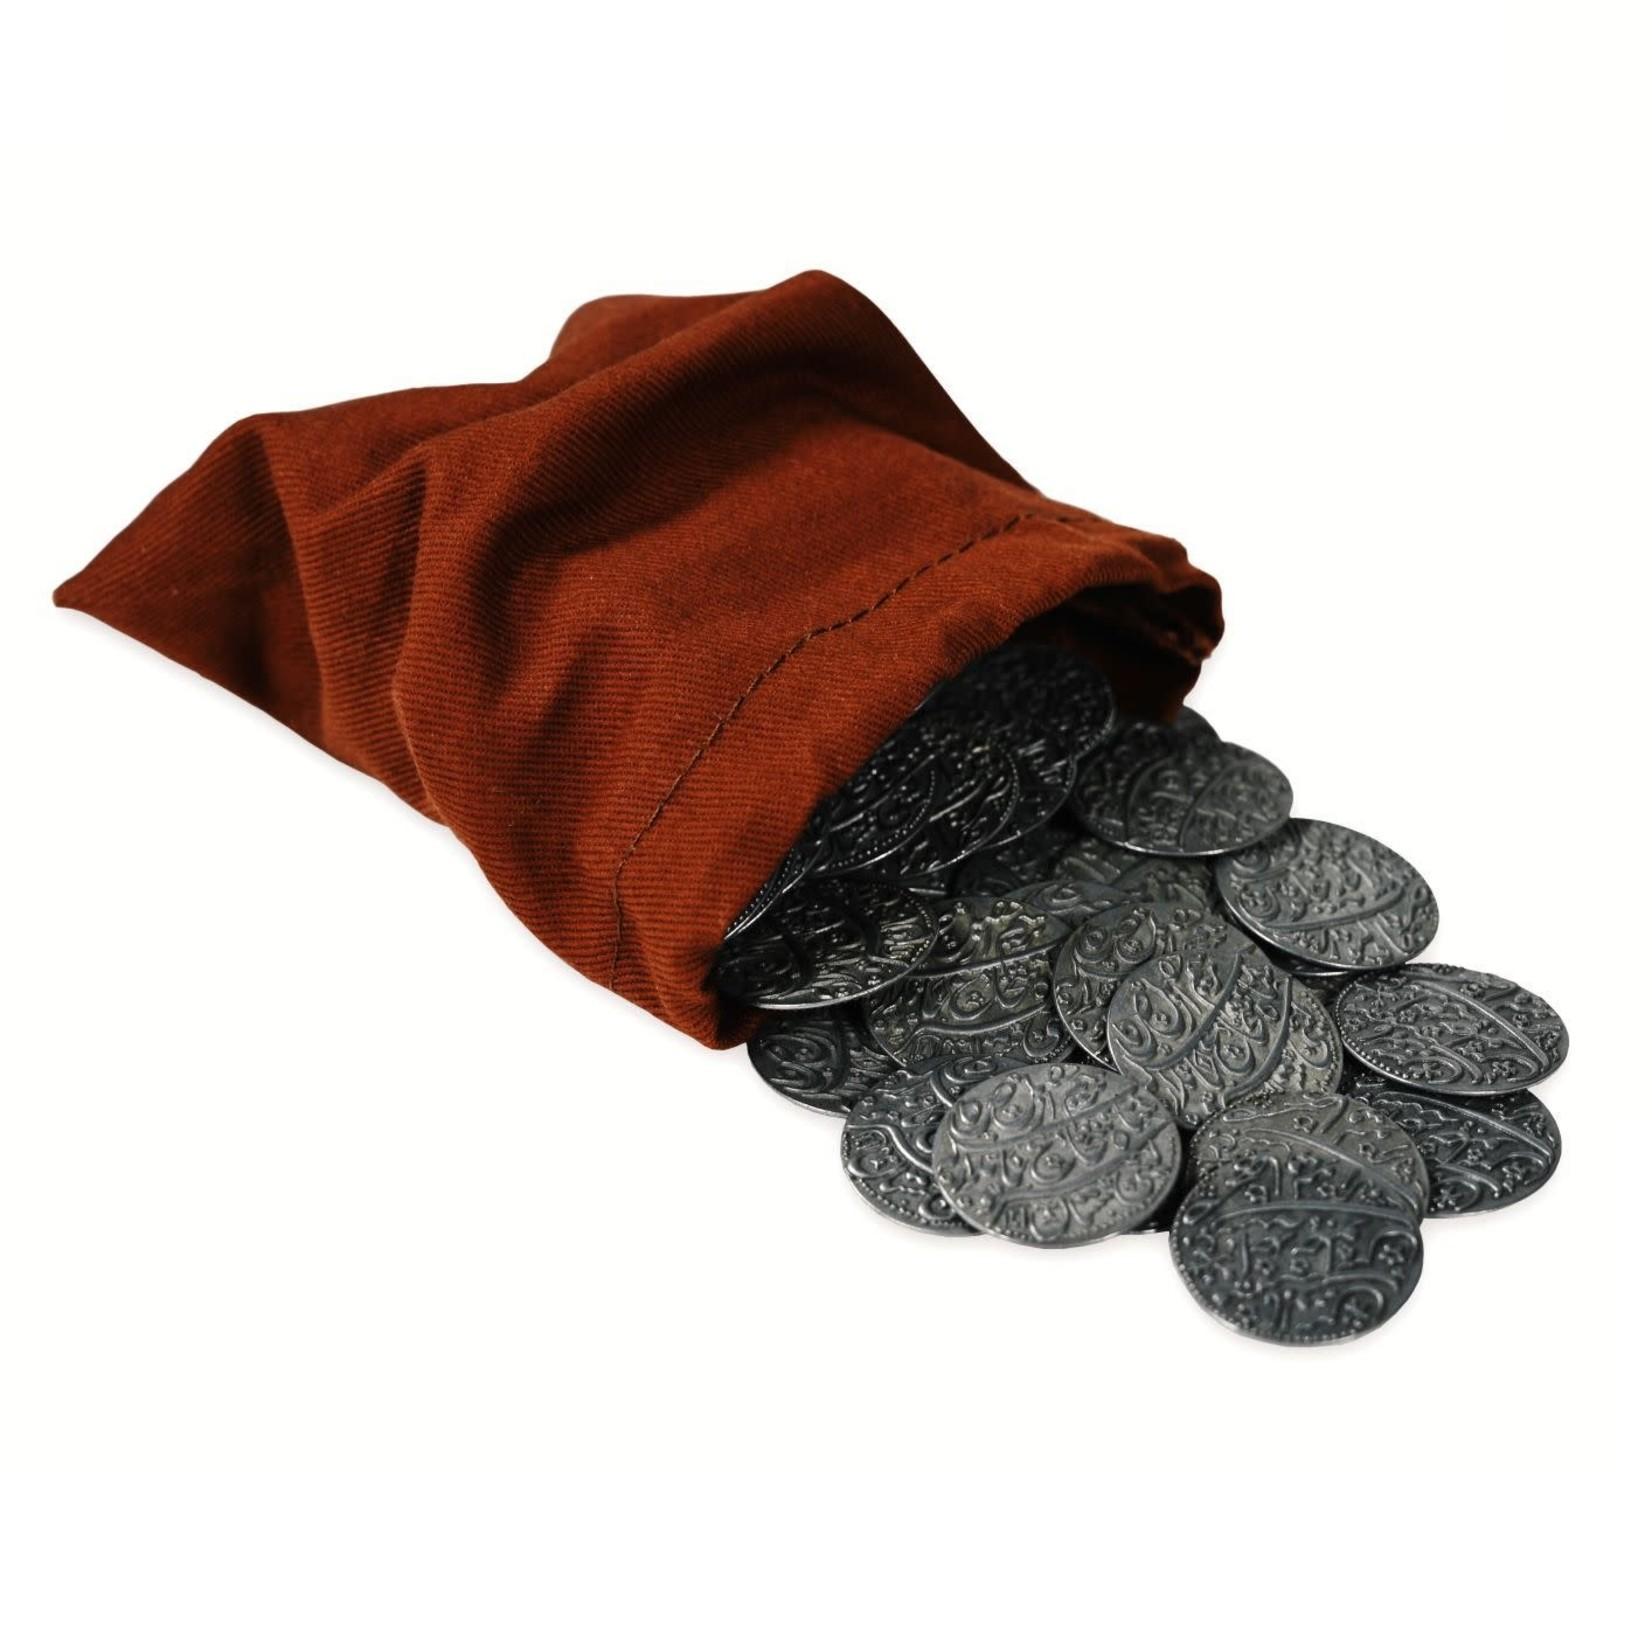 Wehrlegig Games Pax Pamir: Metal Coins and Cloth Bag